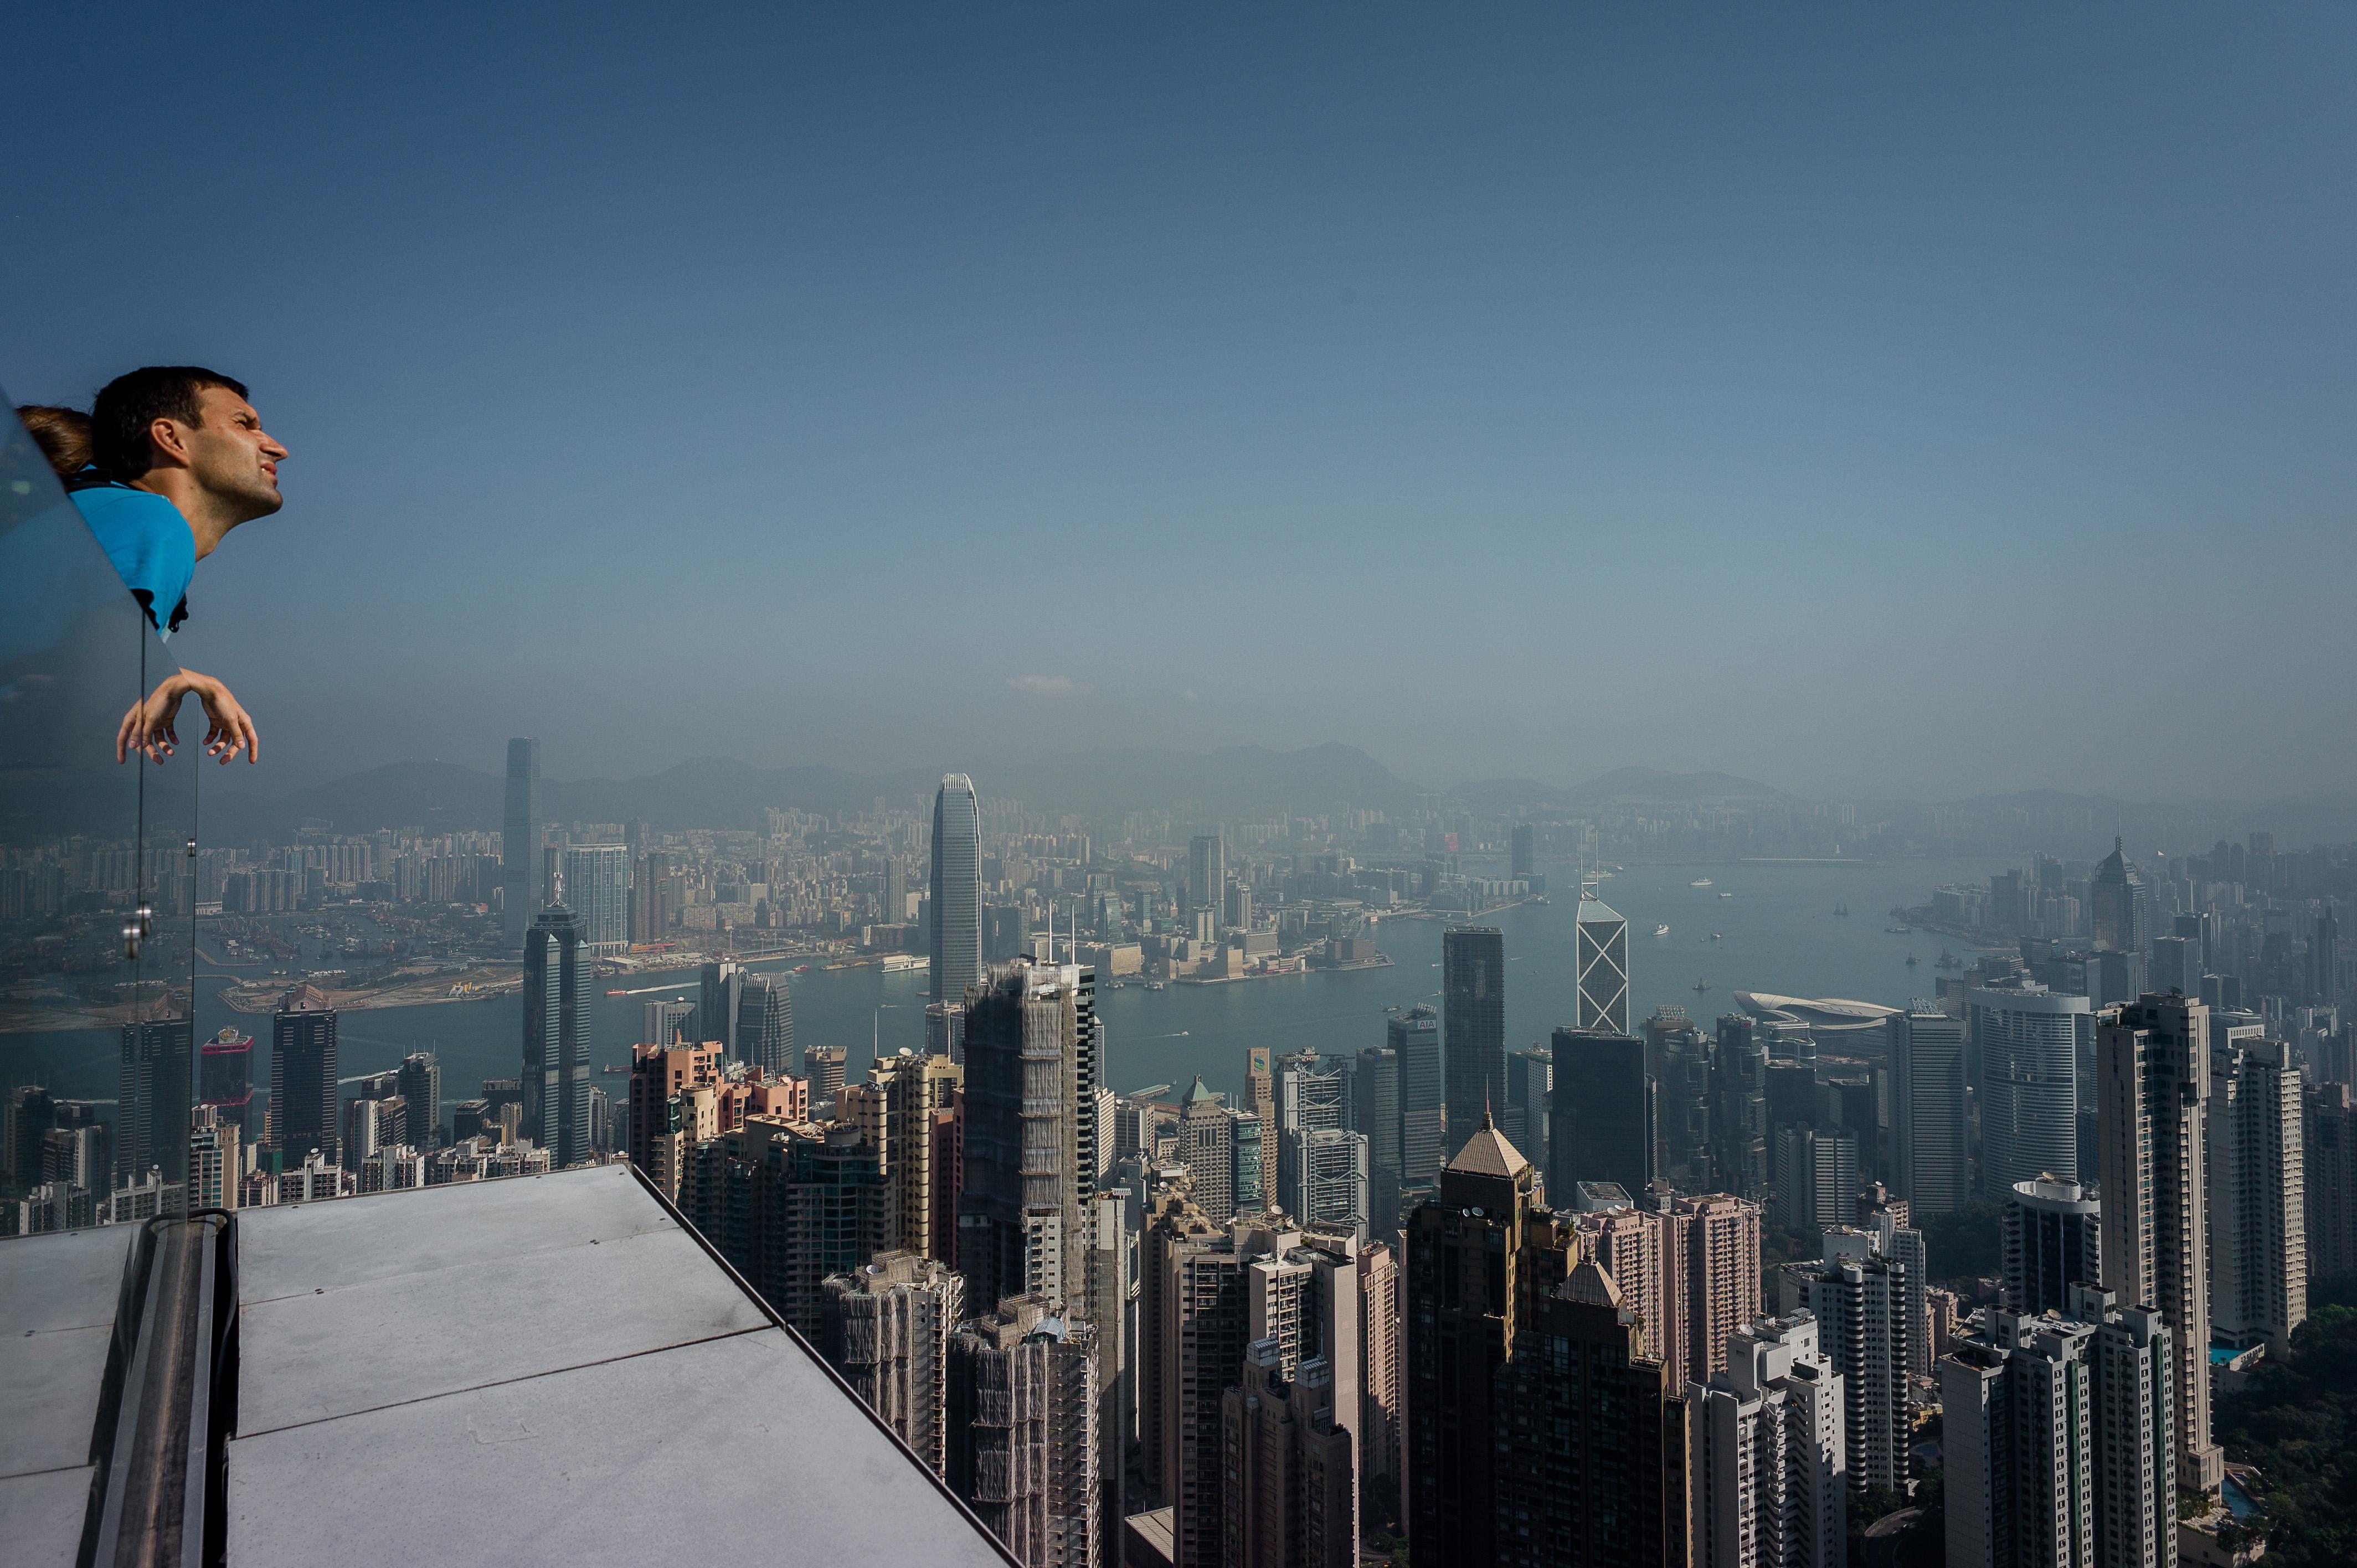 Air pollution causes lung cancer, World Health Organization